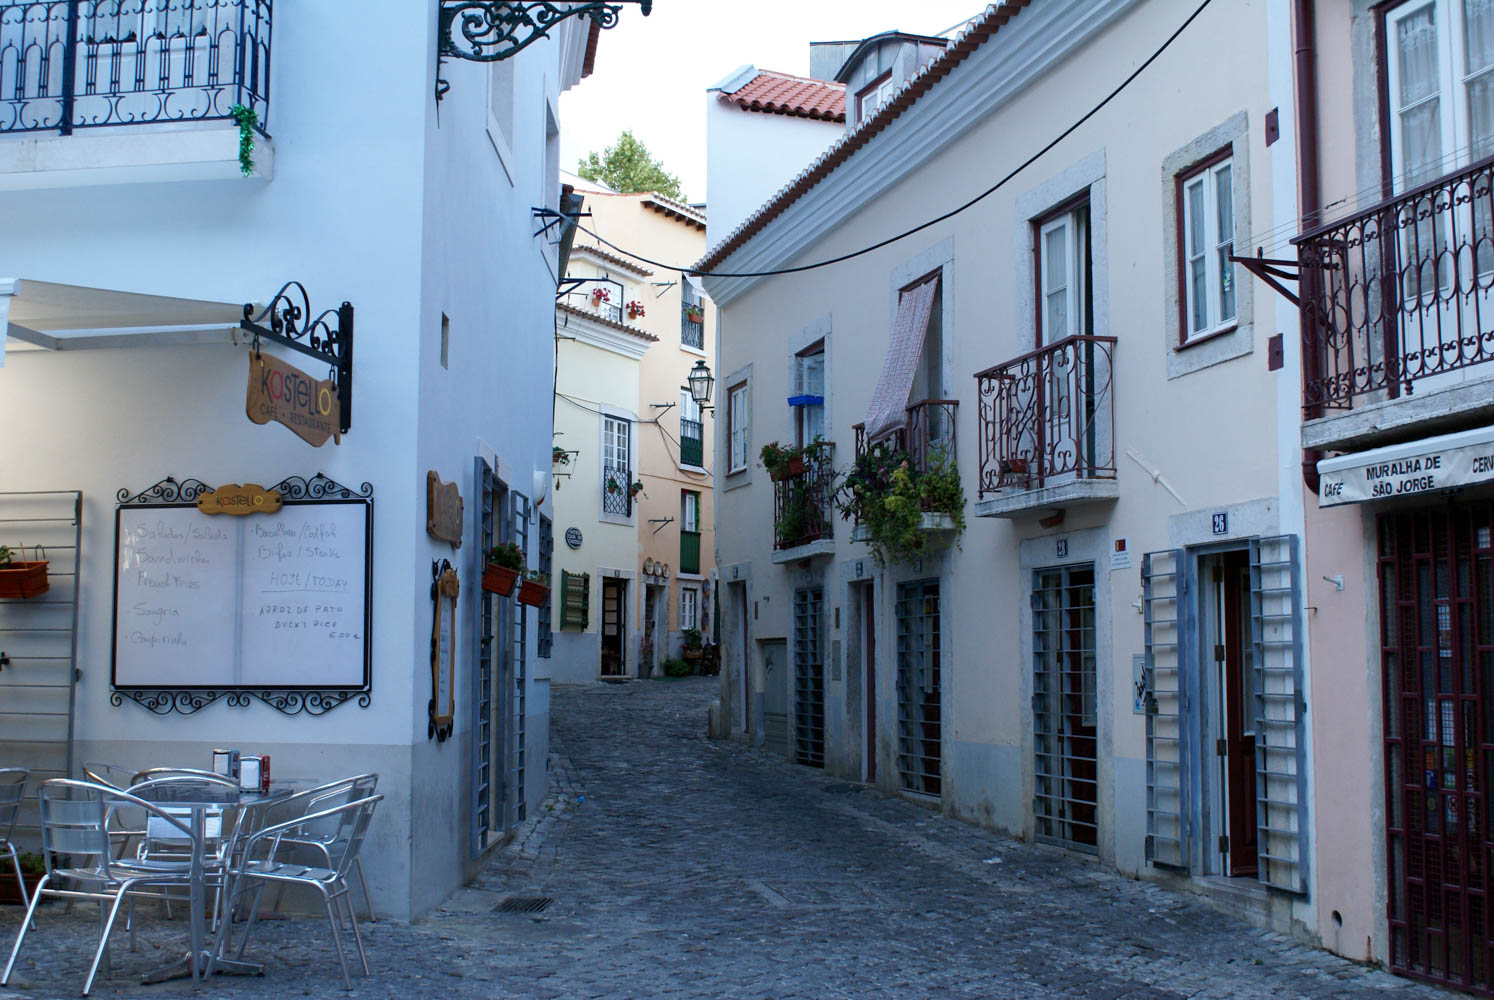 Narrow alleyways wind through the Alfama